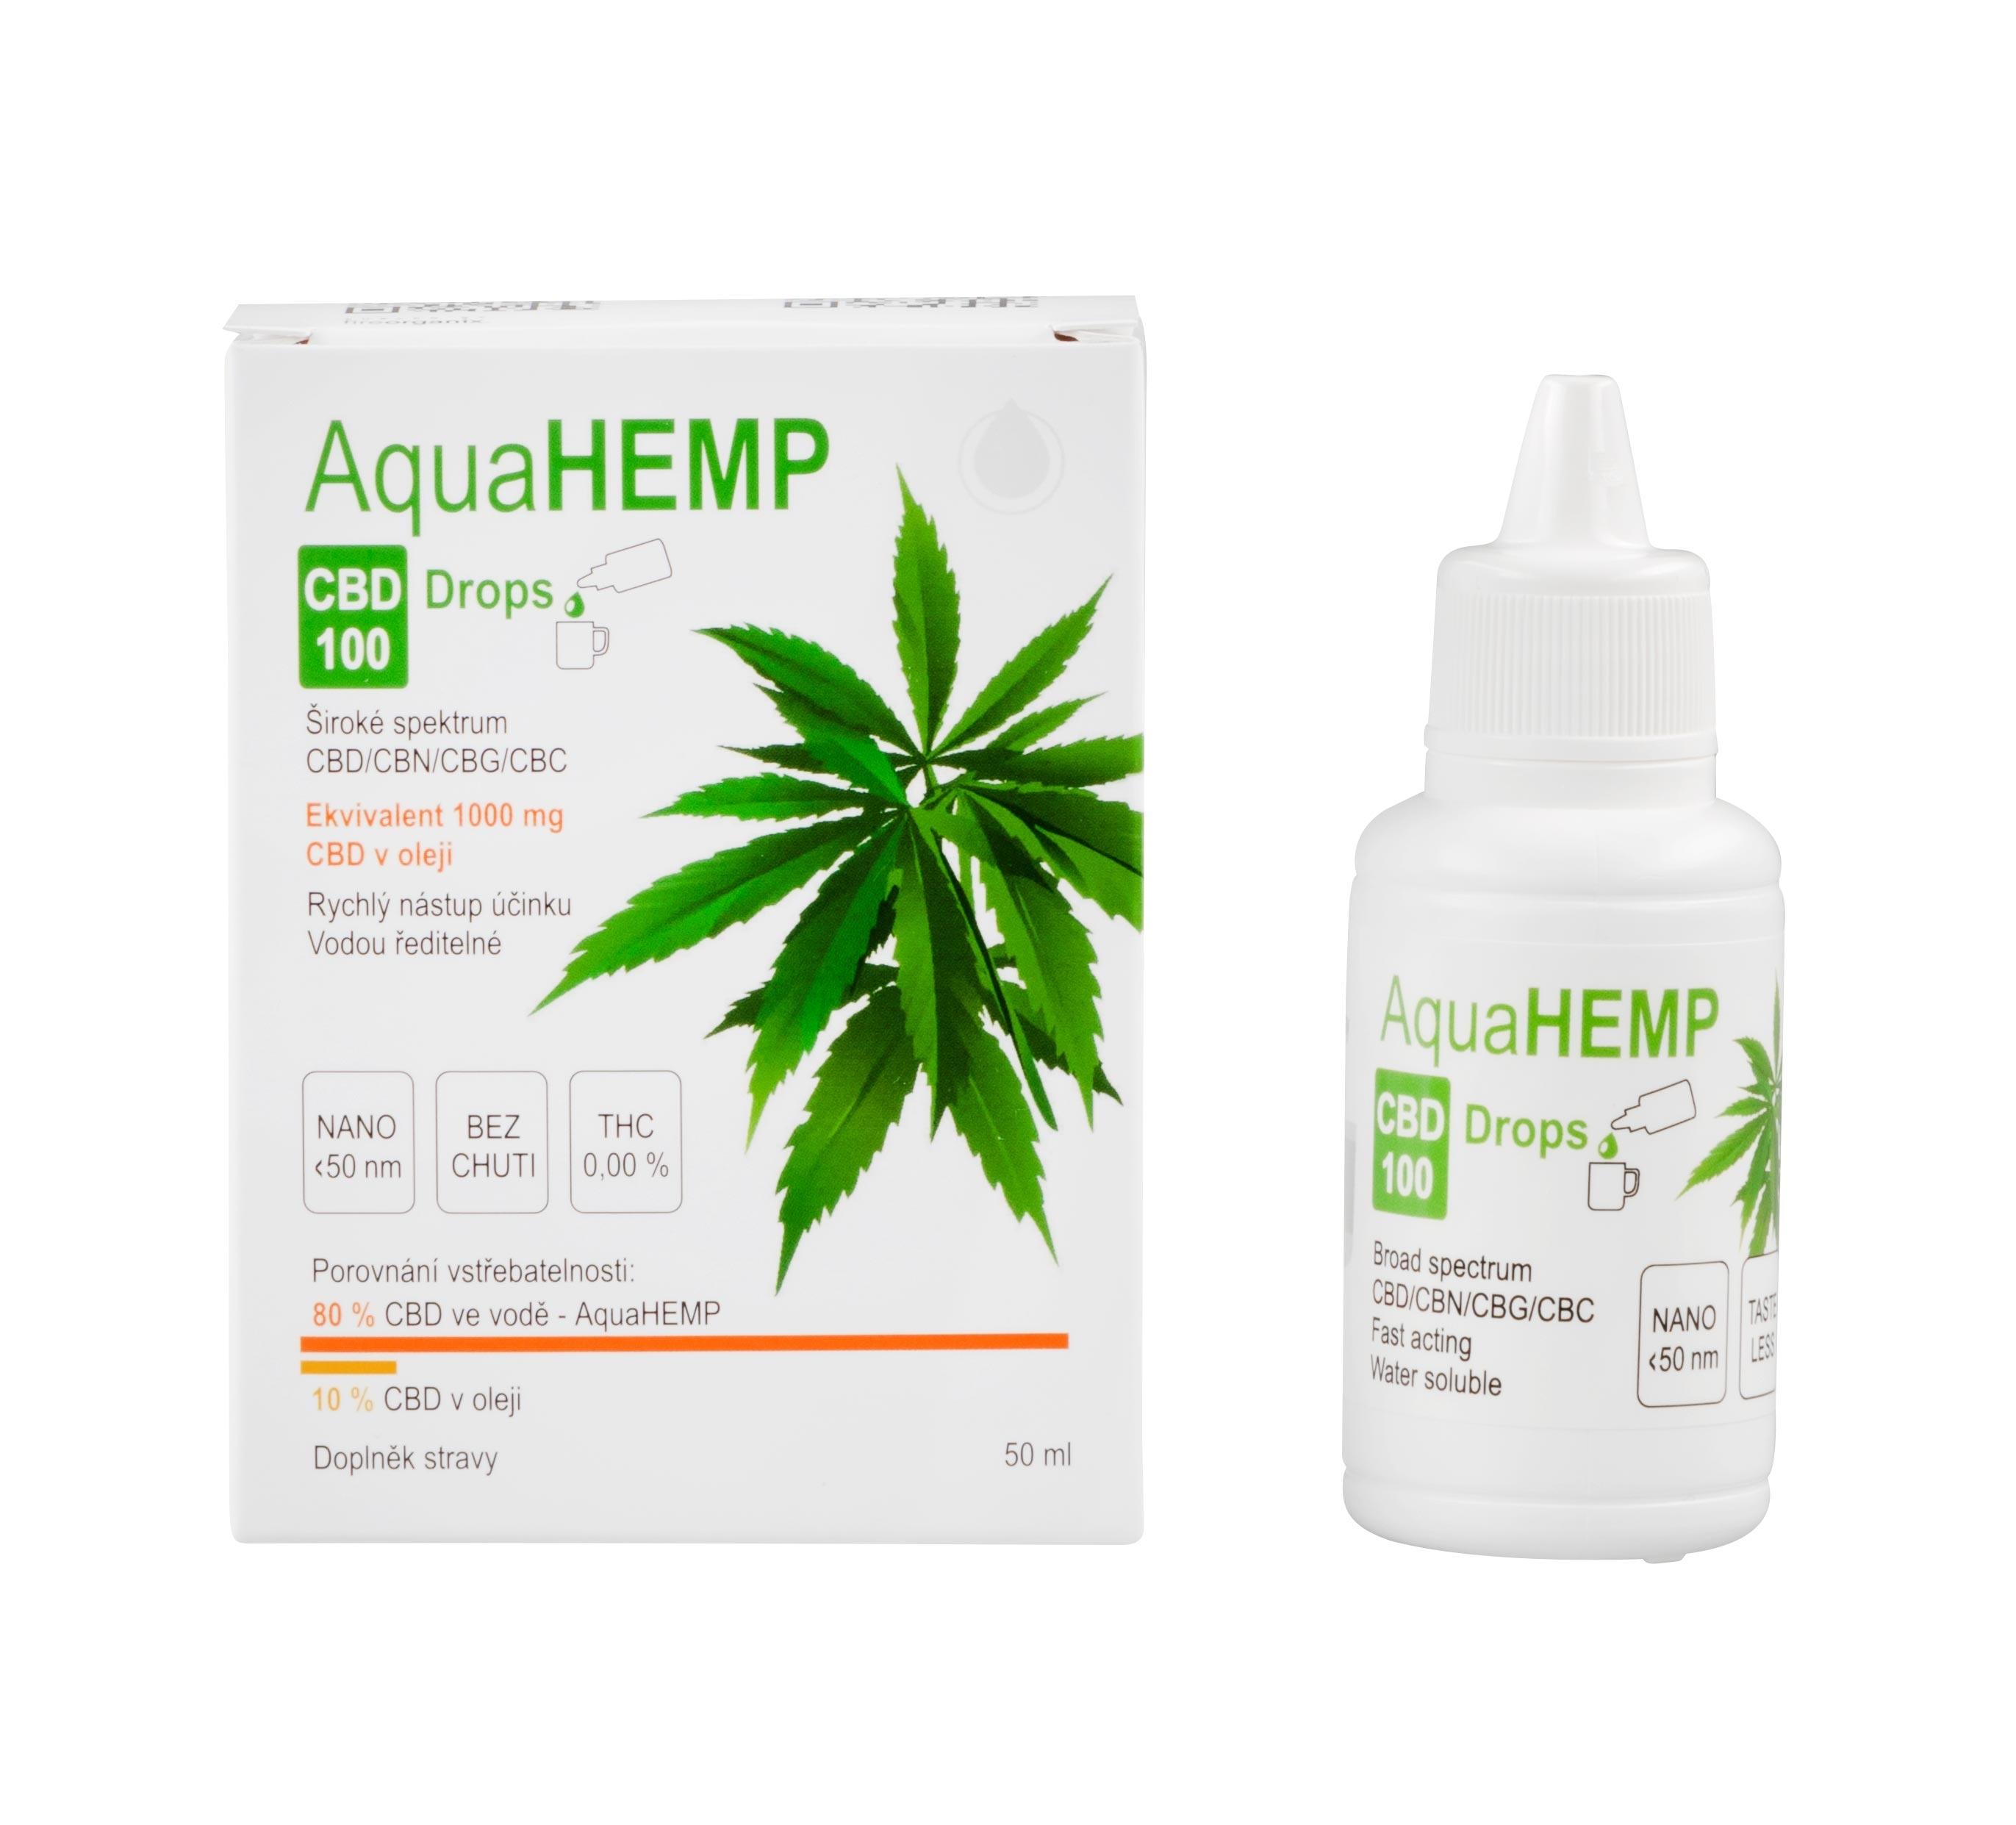 AquaHEMP CBD 100 Drops isolate 50ml, kapky